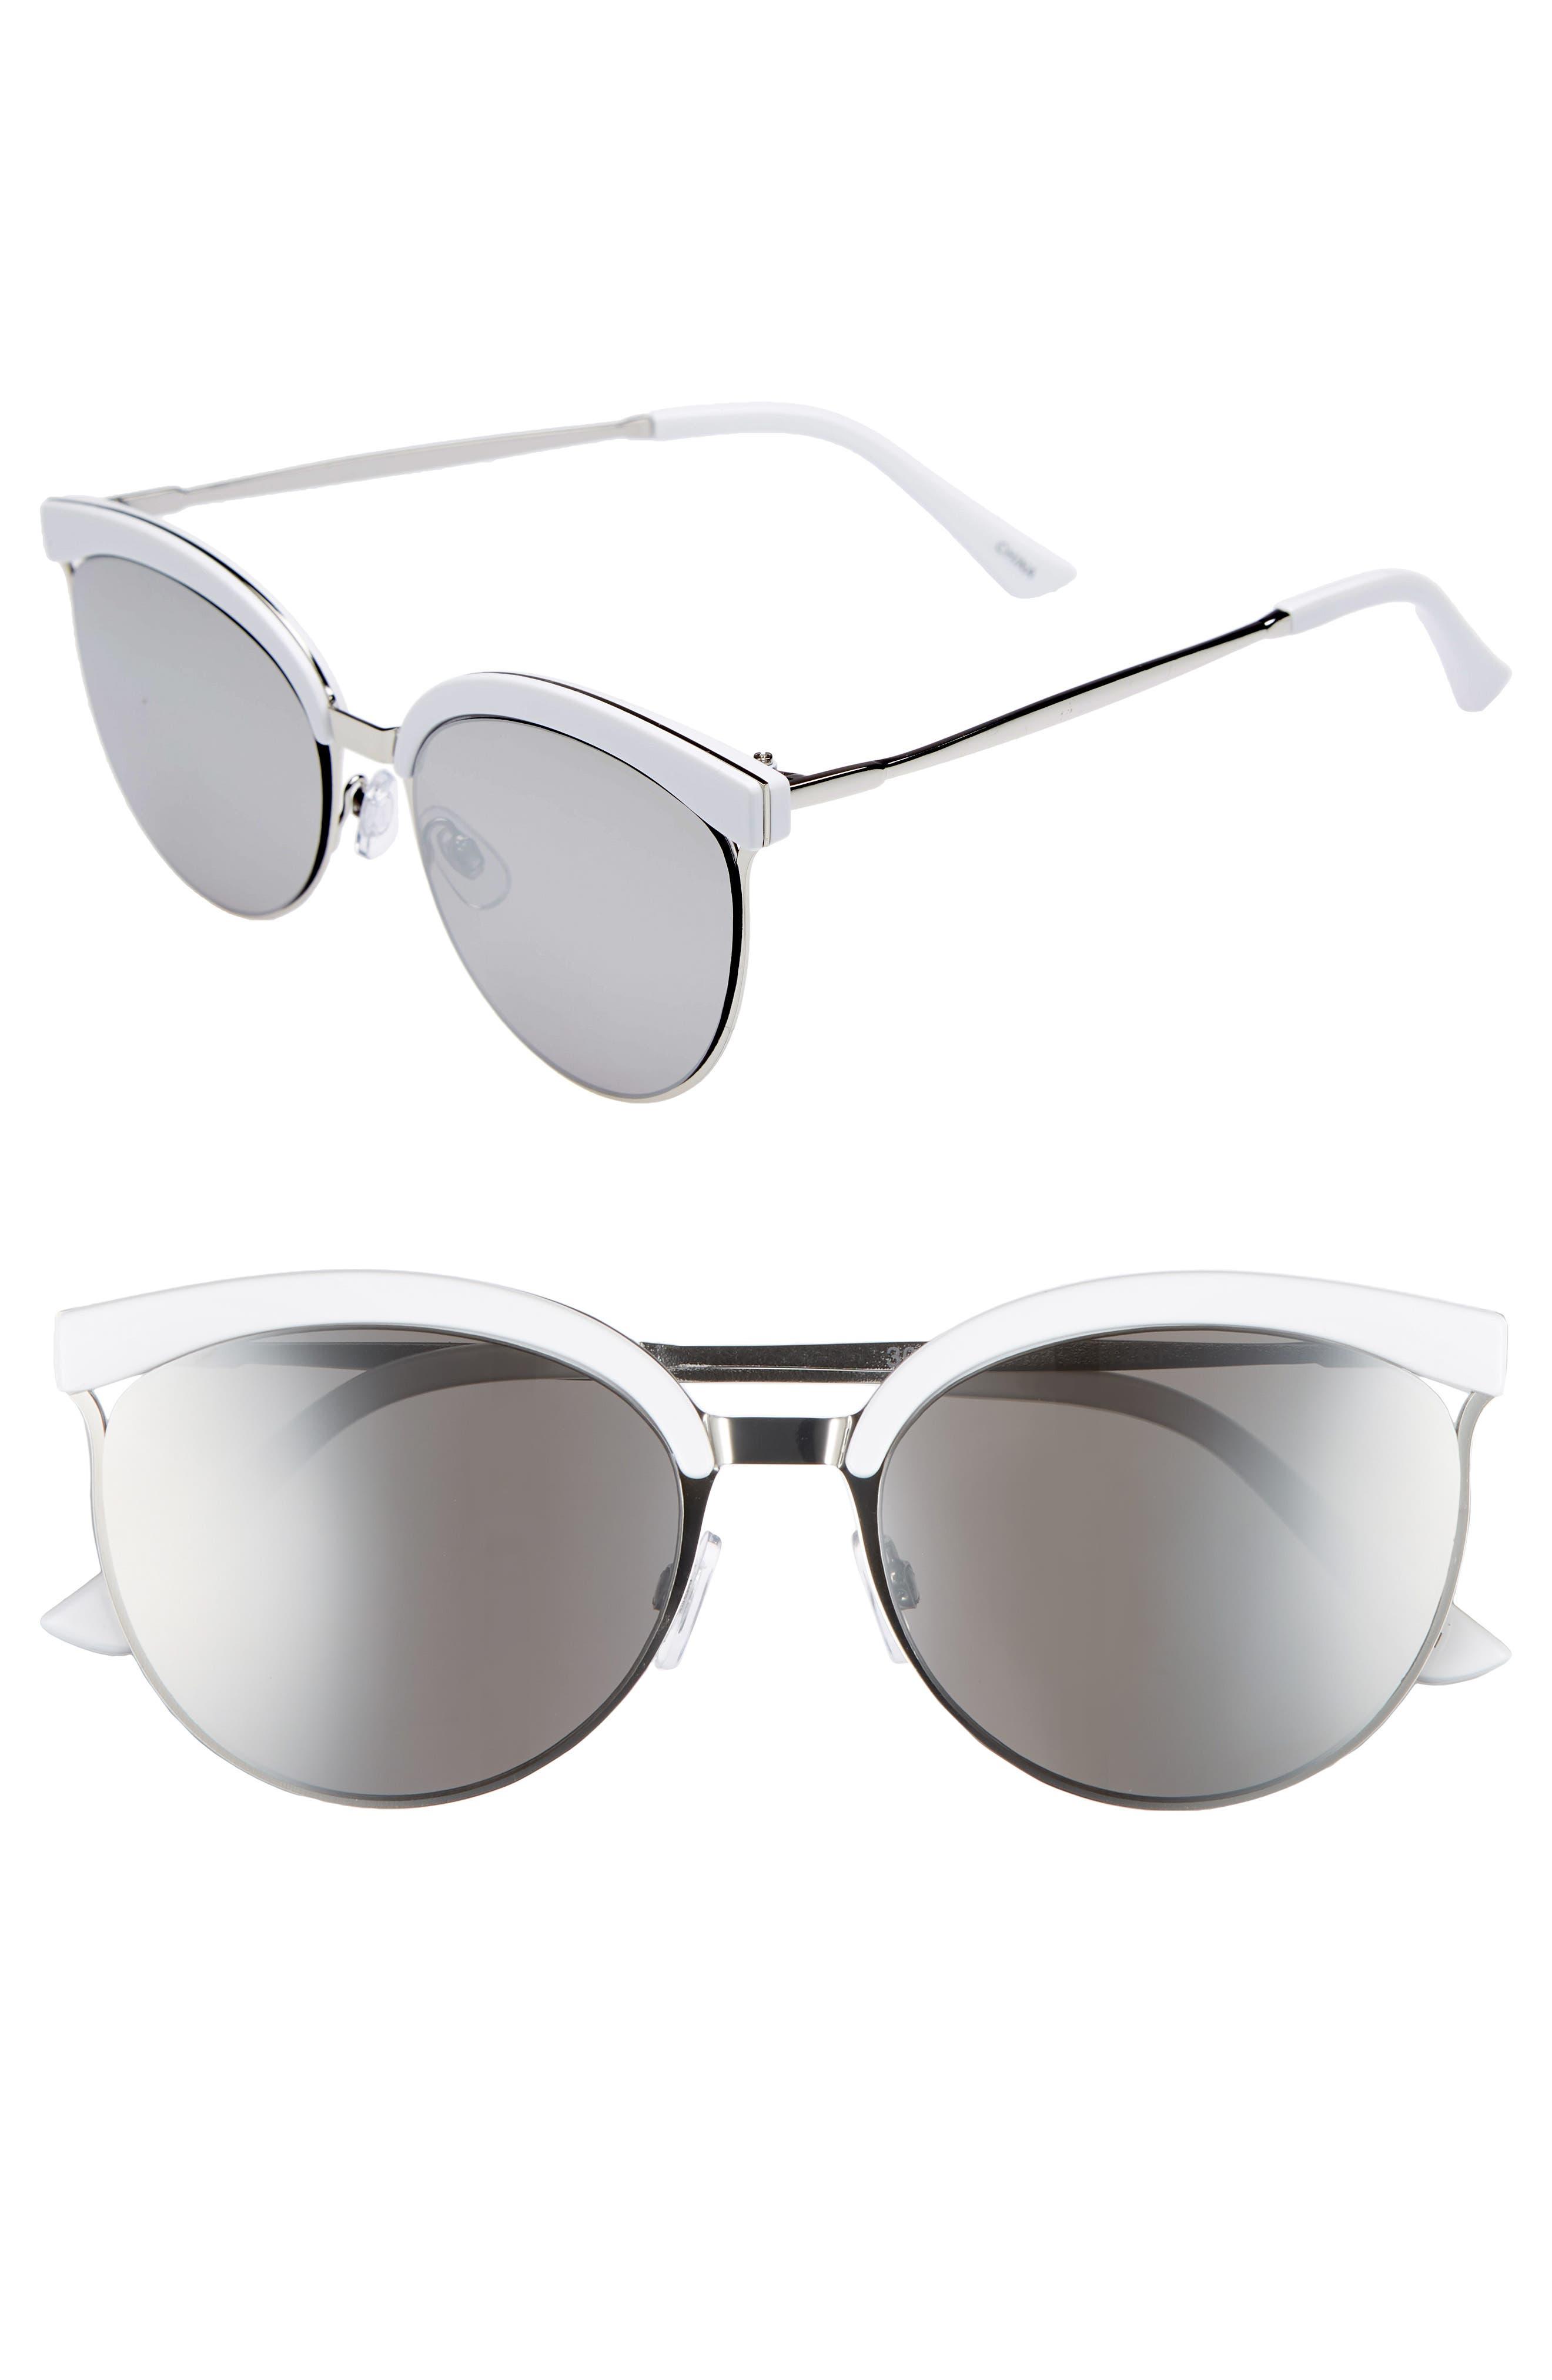 57mm Round Sunglasses,                             Main thumbnail 1, color,                             100